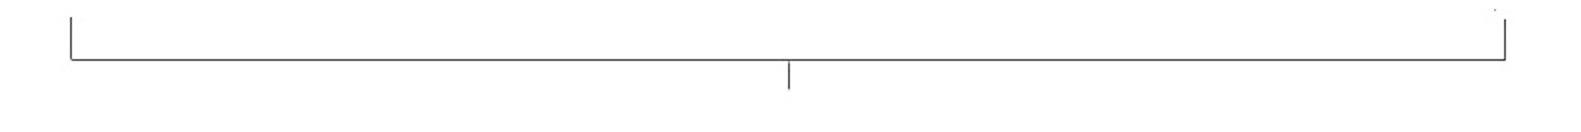 handle-line.jpg